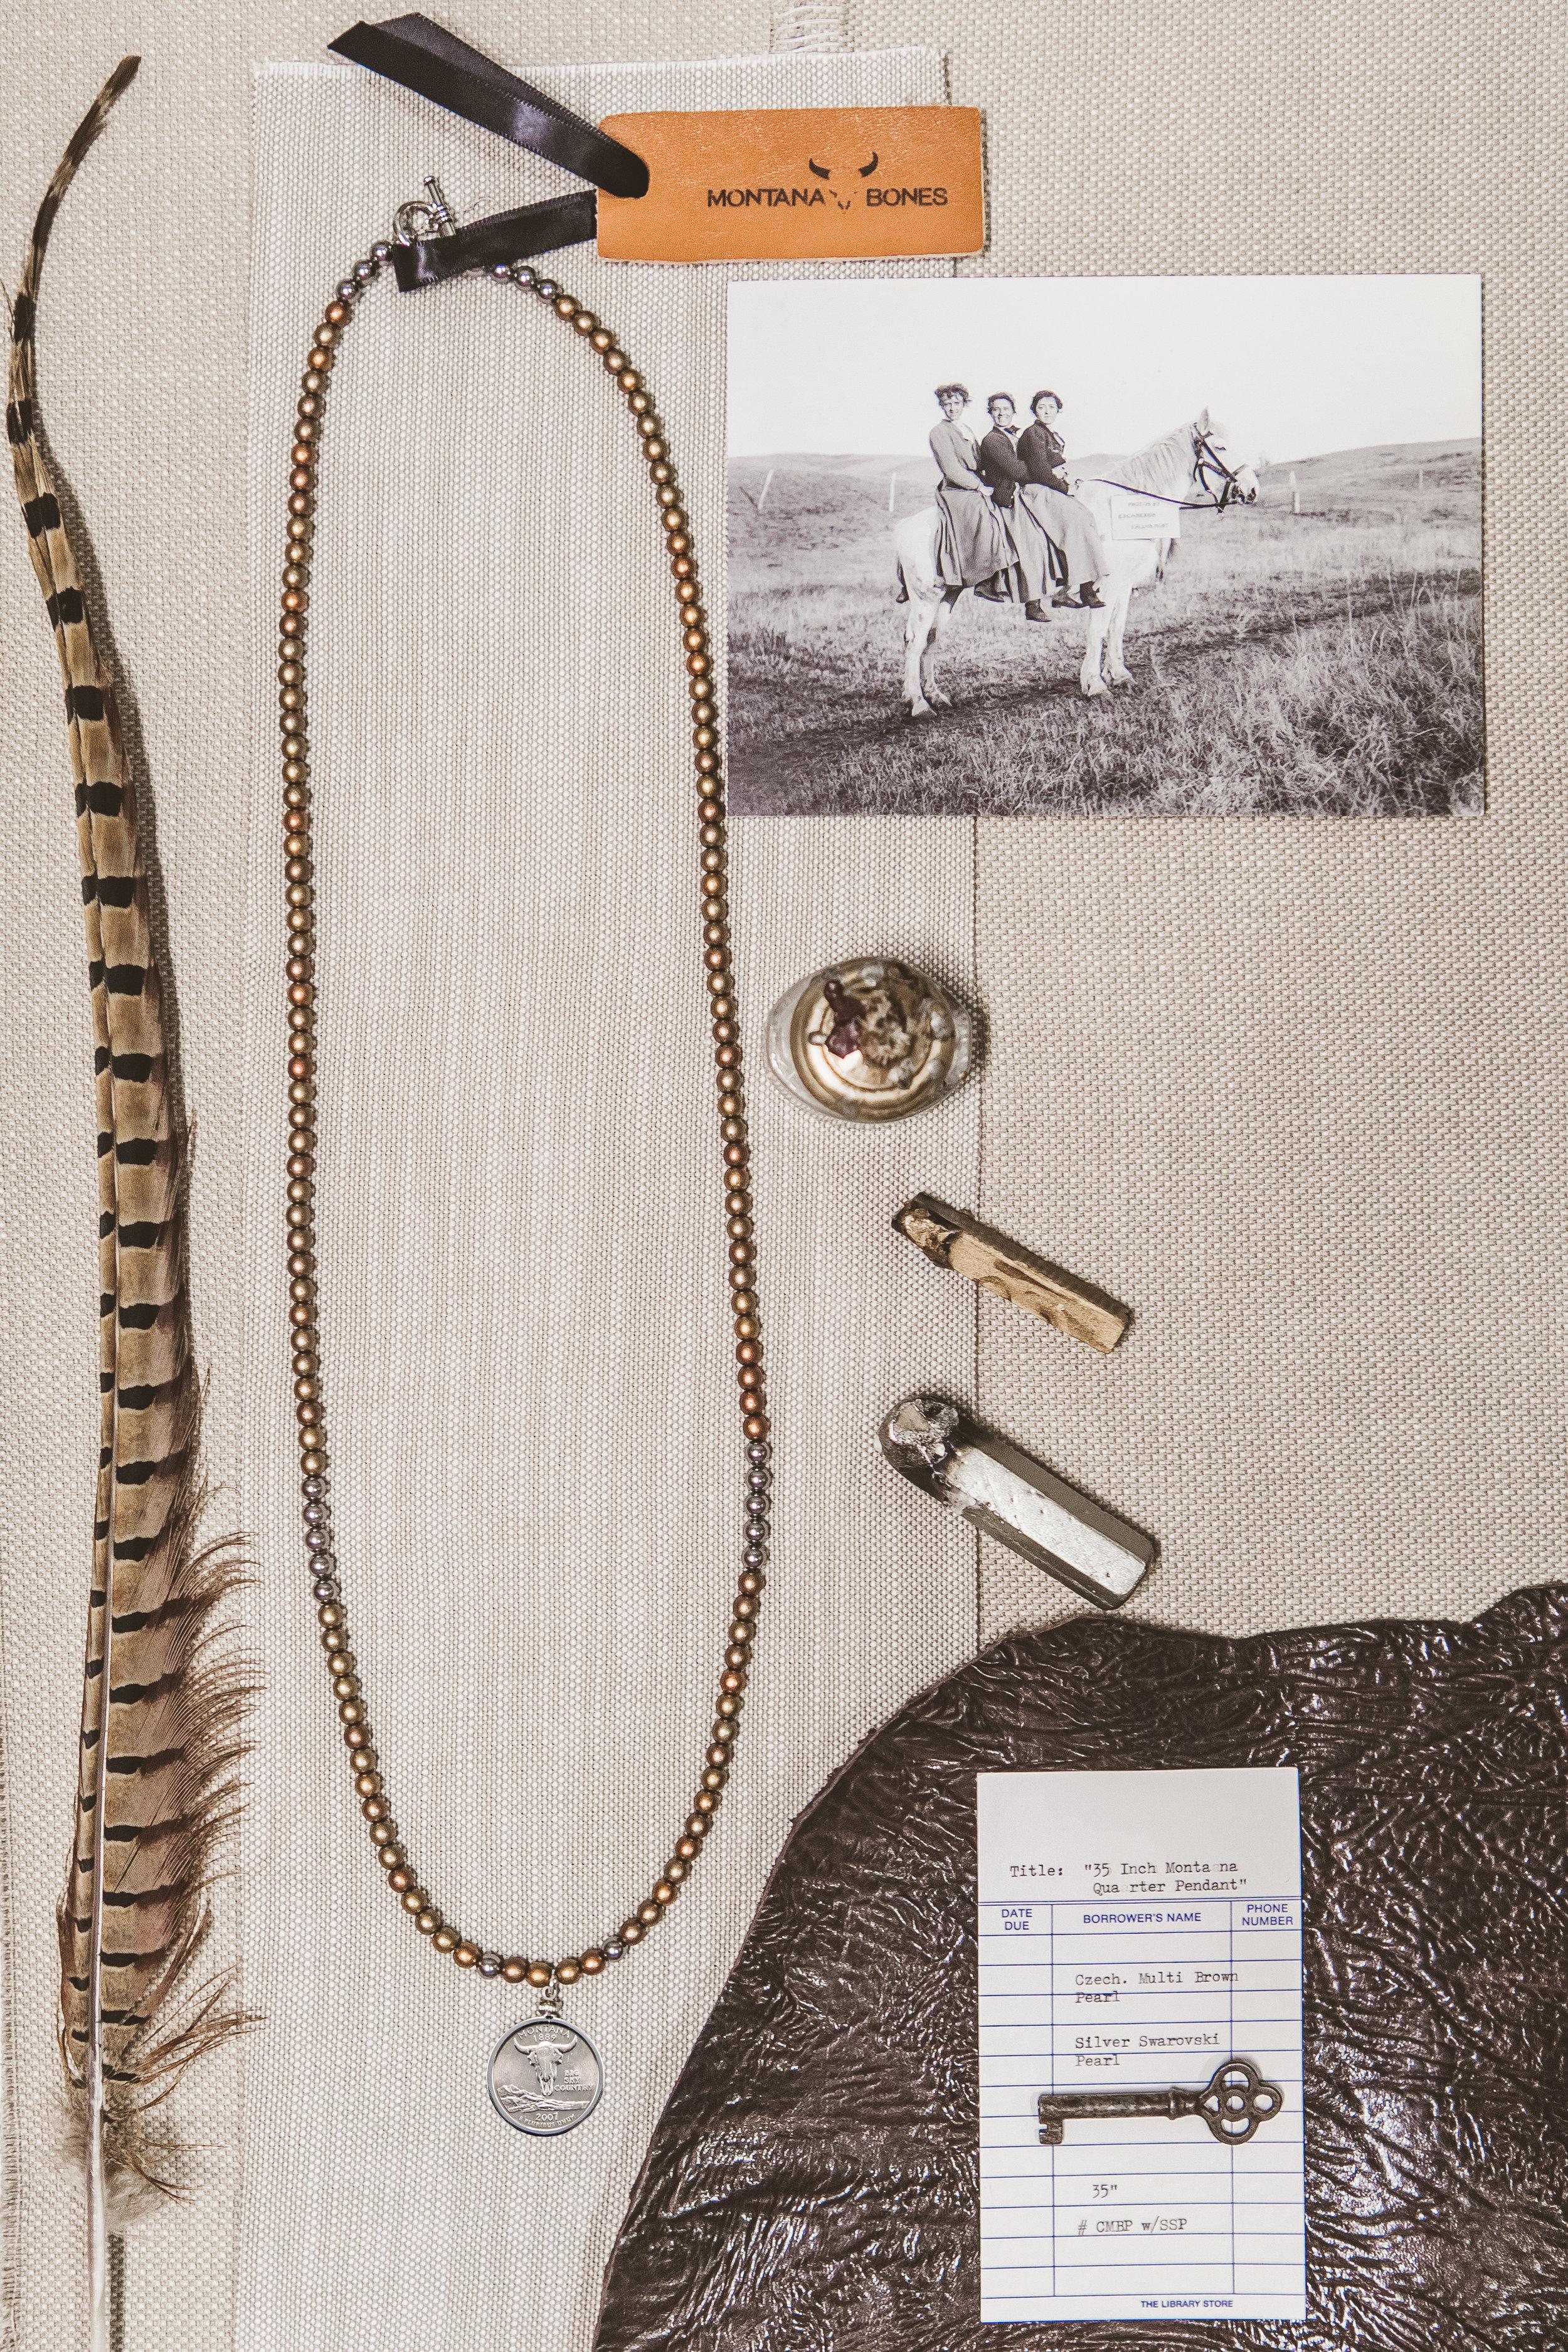 Montana Bones 35 Montana Quarter Pendant (2 of 4) (1)revised.jpg